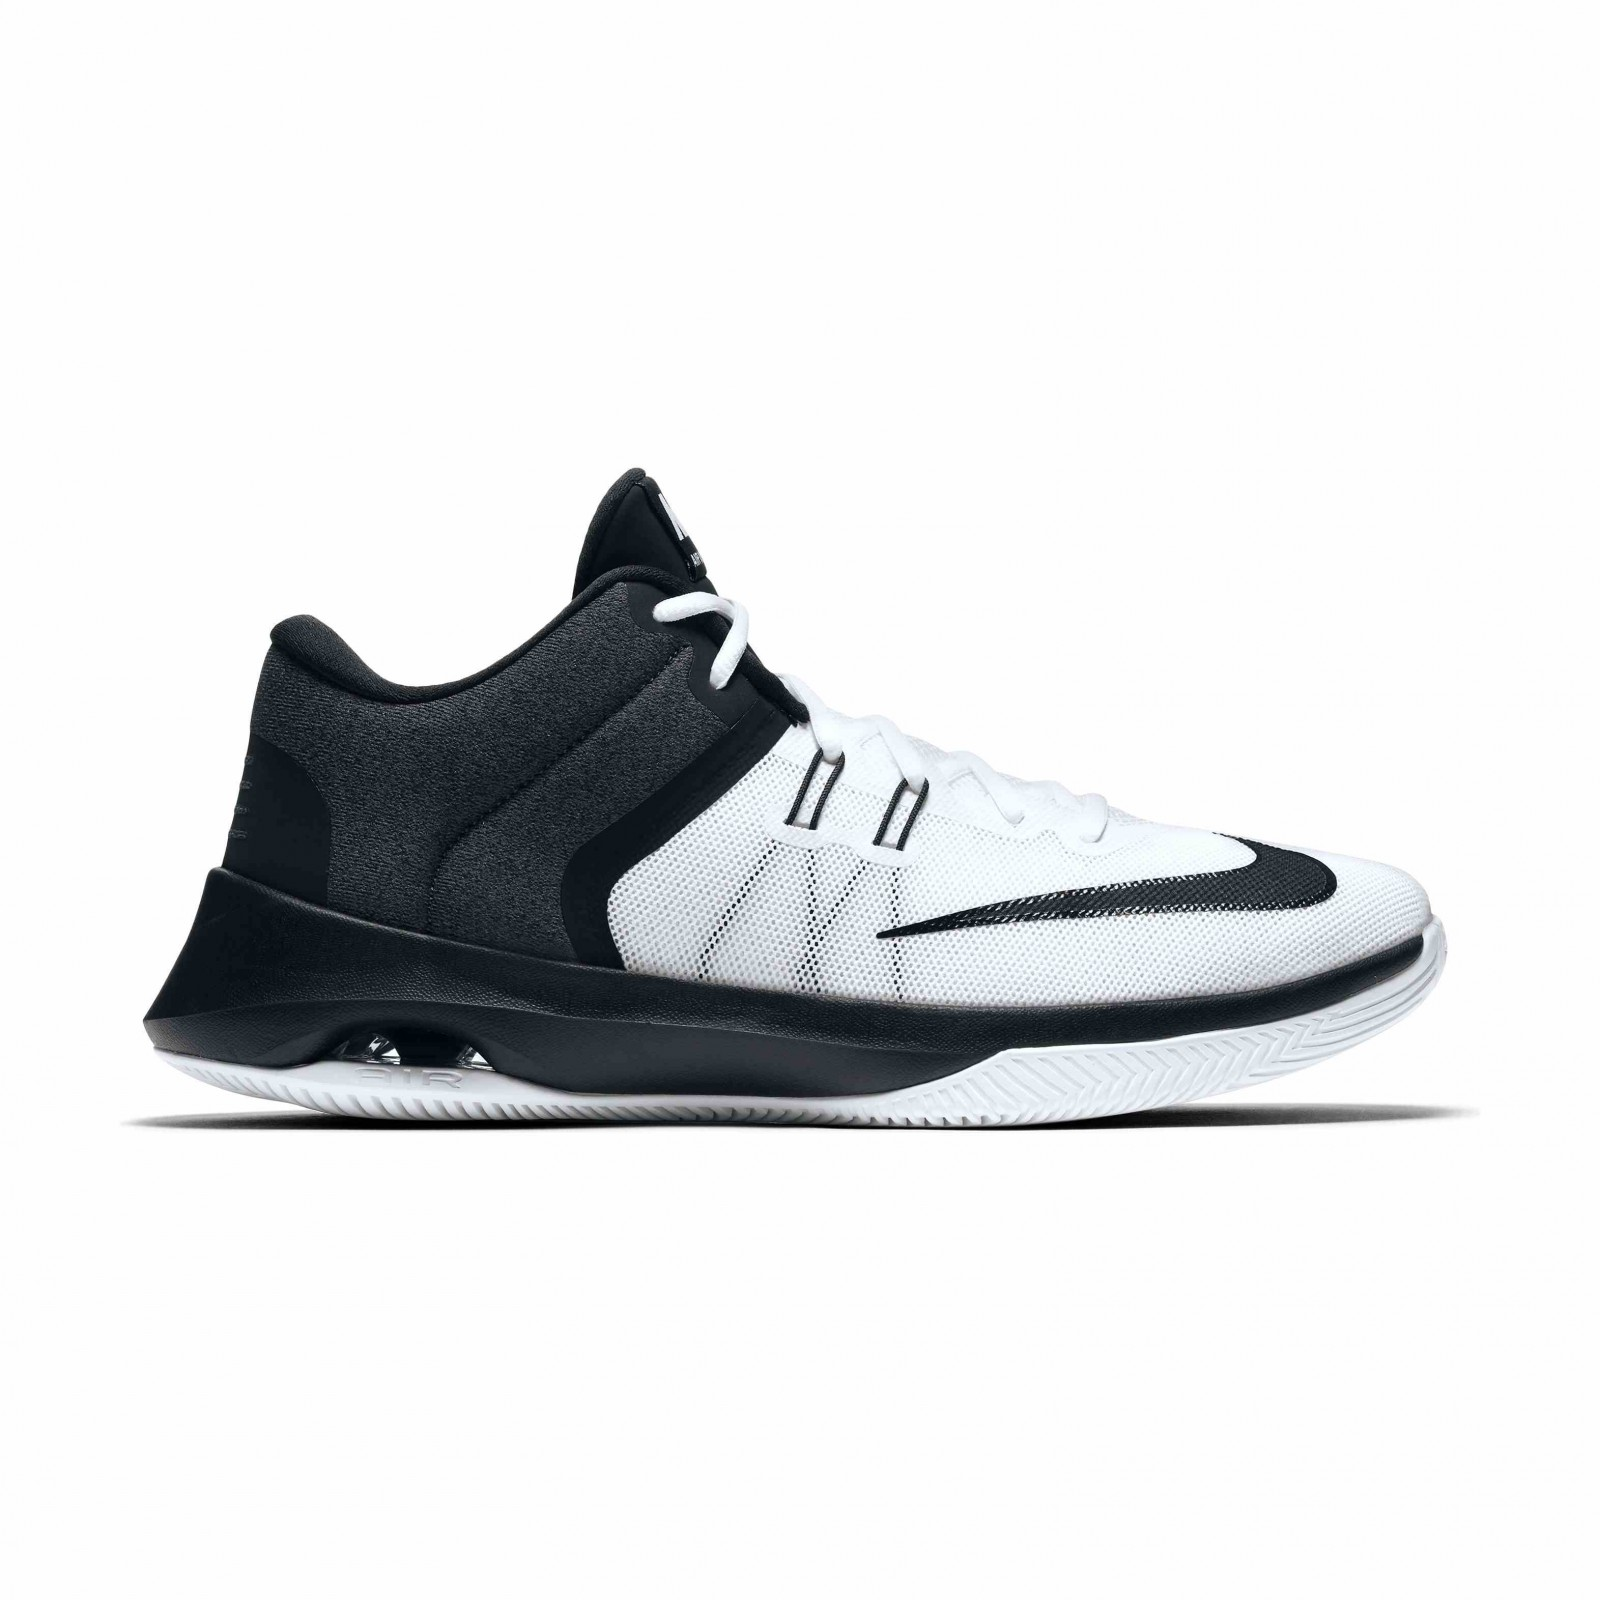 Pánské Basketbalové boty Nike AIR VERSITILE II  989f051bedd